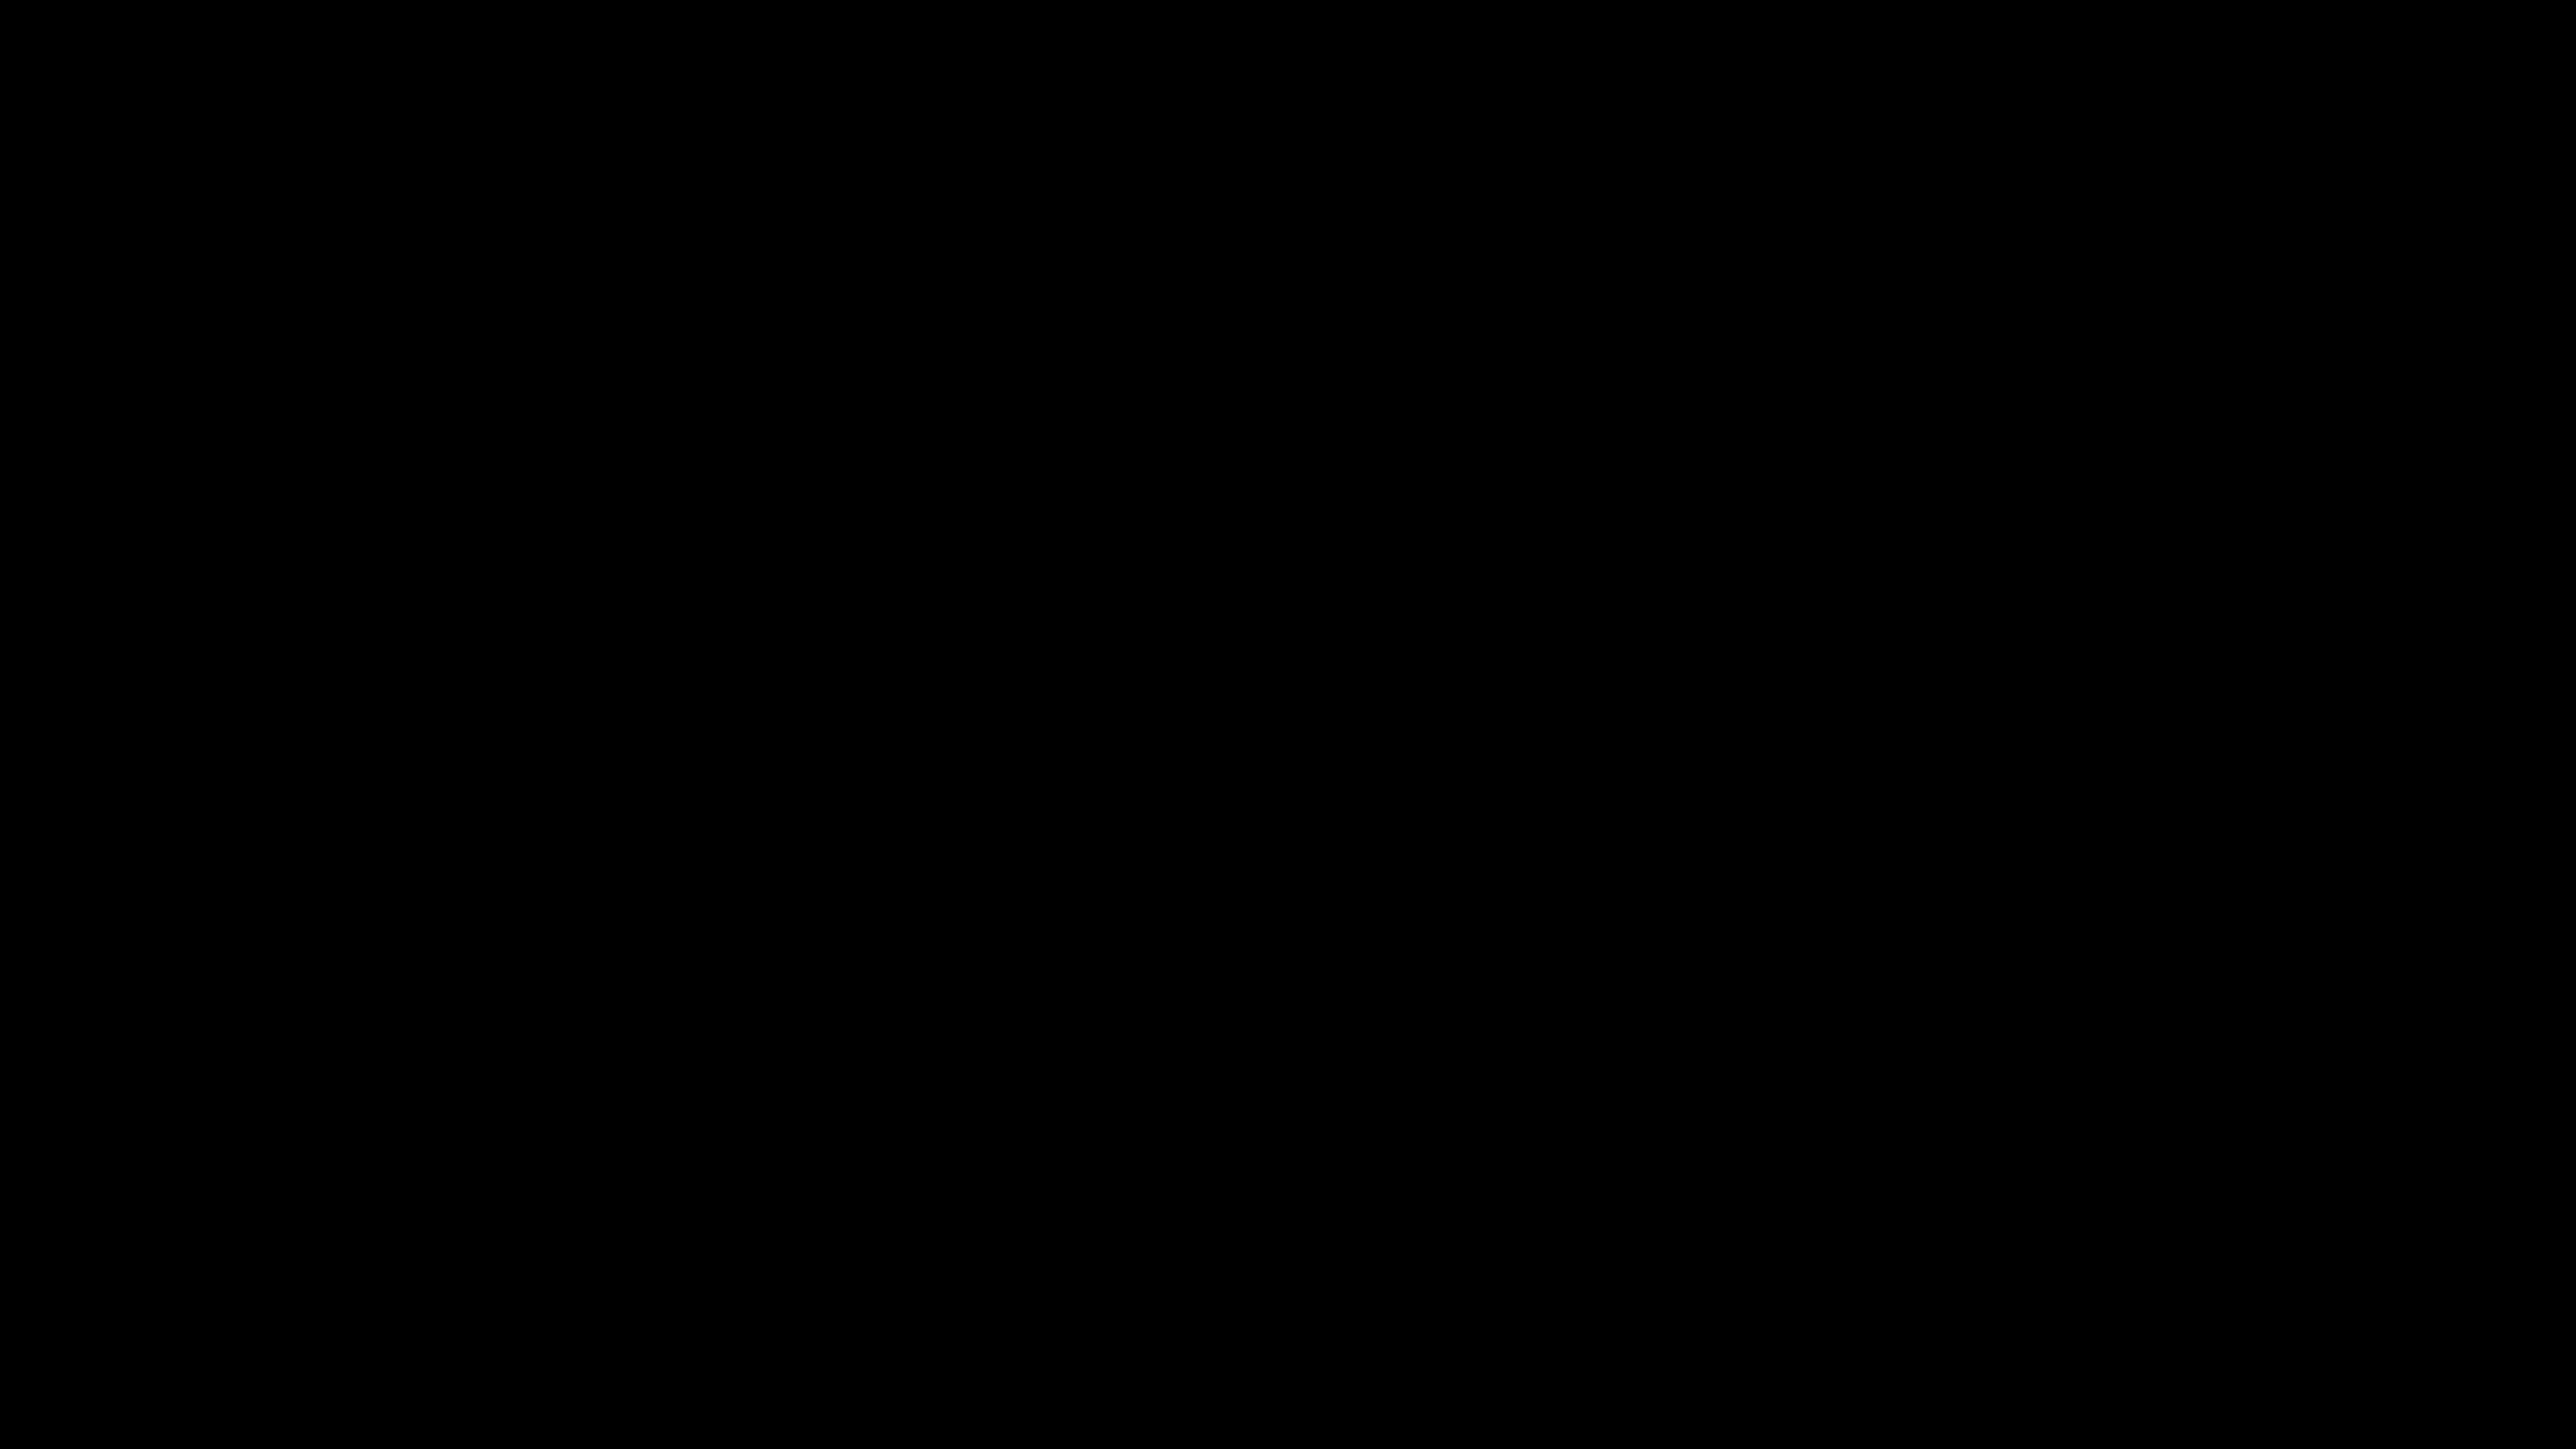 1vs1, BloodRun Intel, Duel, Elder, Evil, Furious Heights, QuakeCon, QuakeCon 2016, QuakeCon16, QuakeCon2016, Qztourney7, Rapha, Sergey Orekhov, Shane Hendrixson, Sinister, intel ztn3, sk-Rapha, skRapha, t7, ztn3, QuakeCon 2016 Grand Final - Rapha vs Evil - [Eng Commentary] QuakeLive 2160p 60fps GIFs